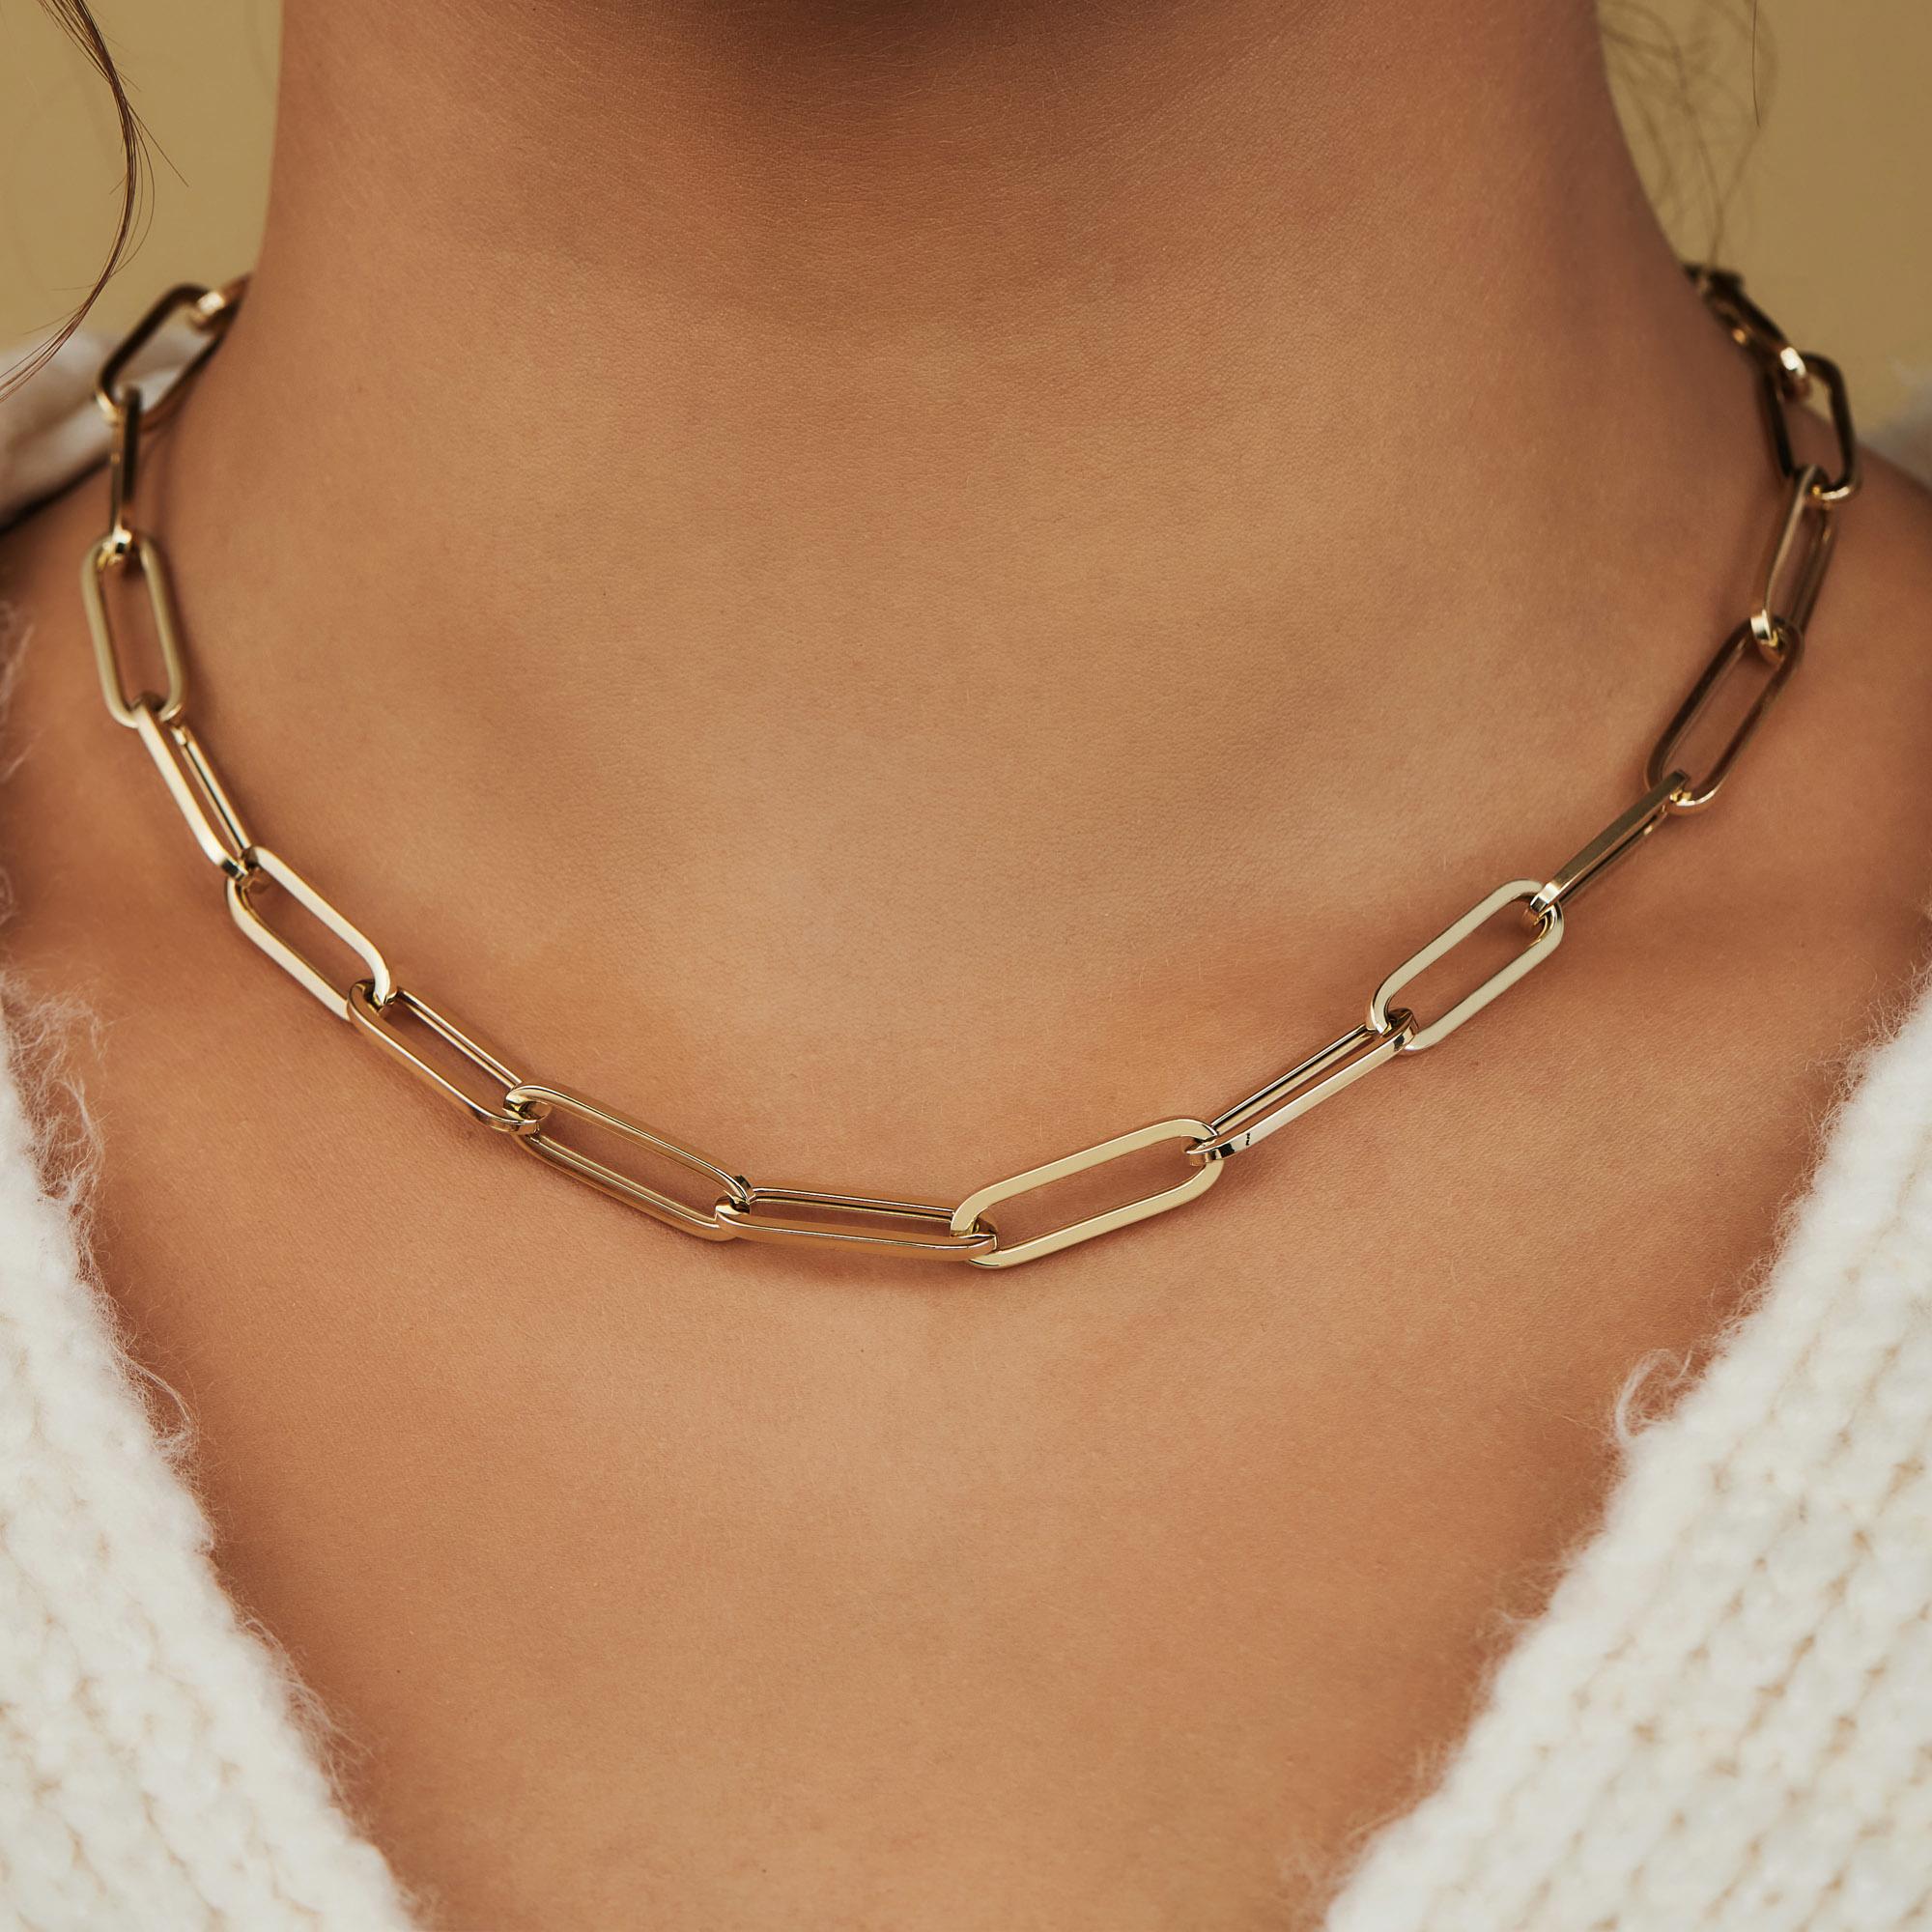 Isabel Bernard Aidee Idalie 14 karat guld link halskæde